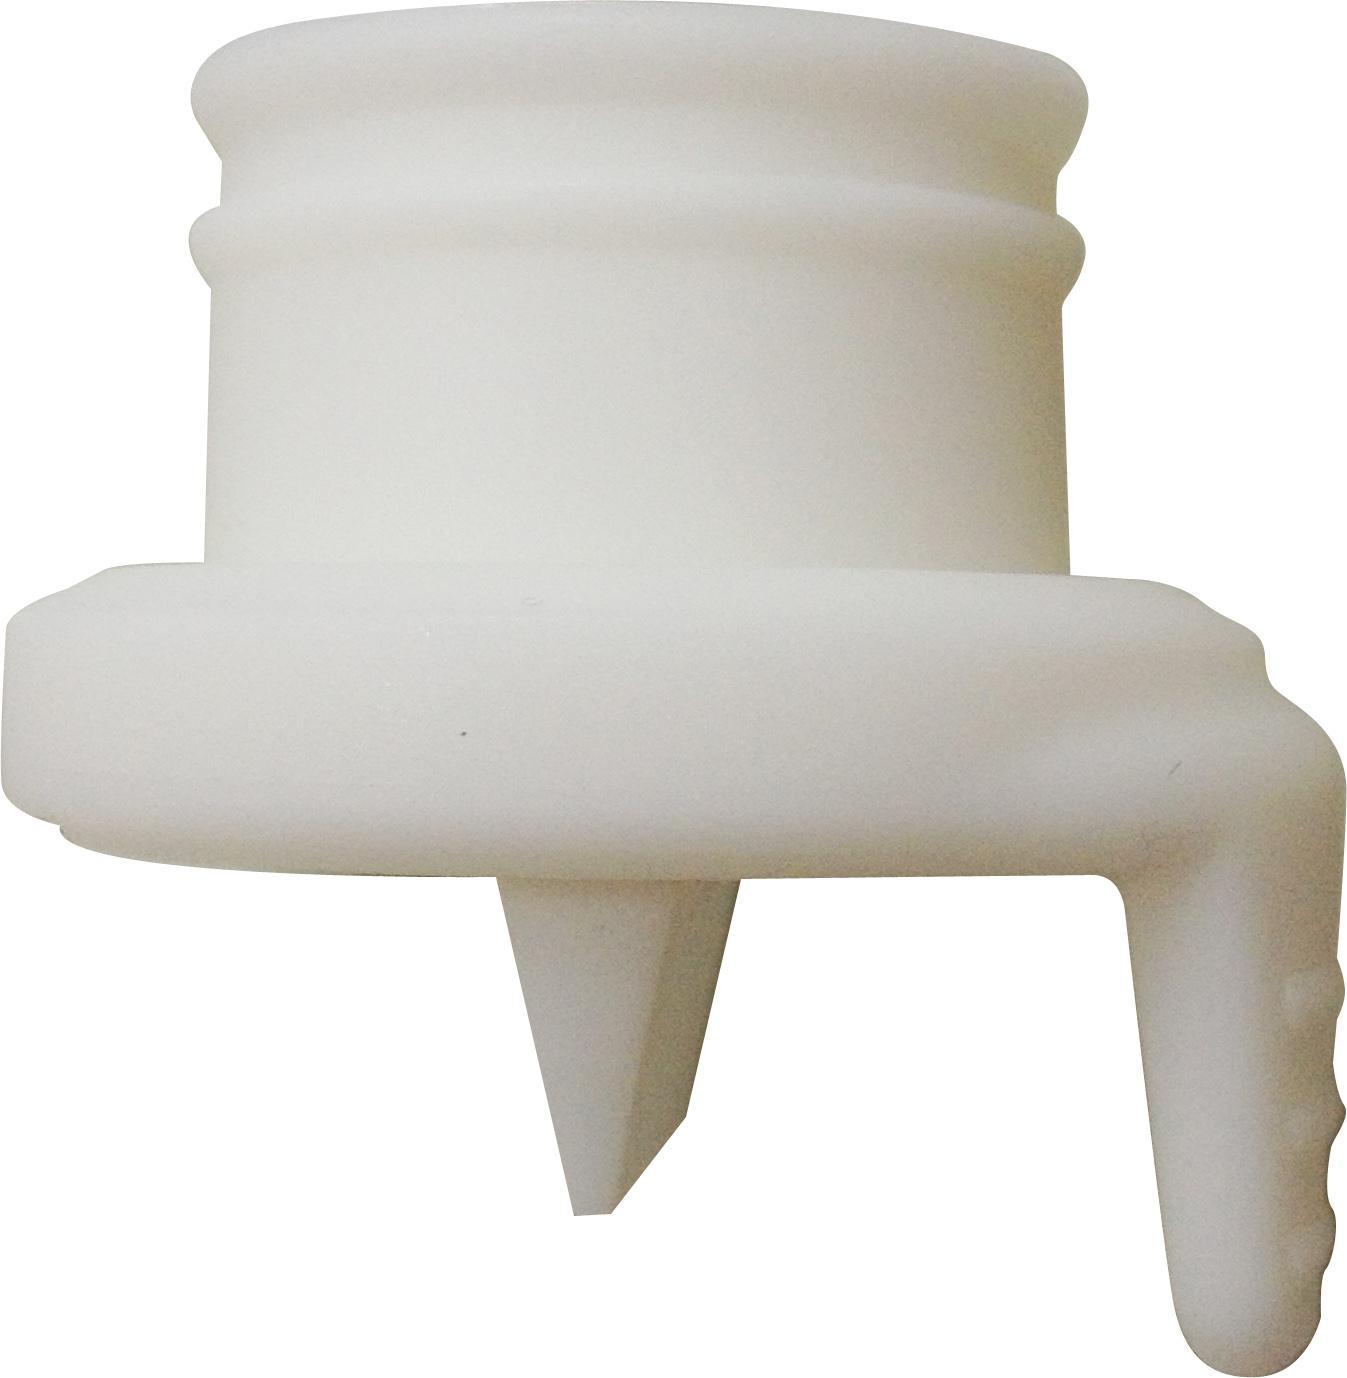 AVENT 輕乳感吸乳器專用白色鴨嘴